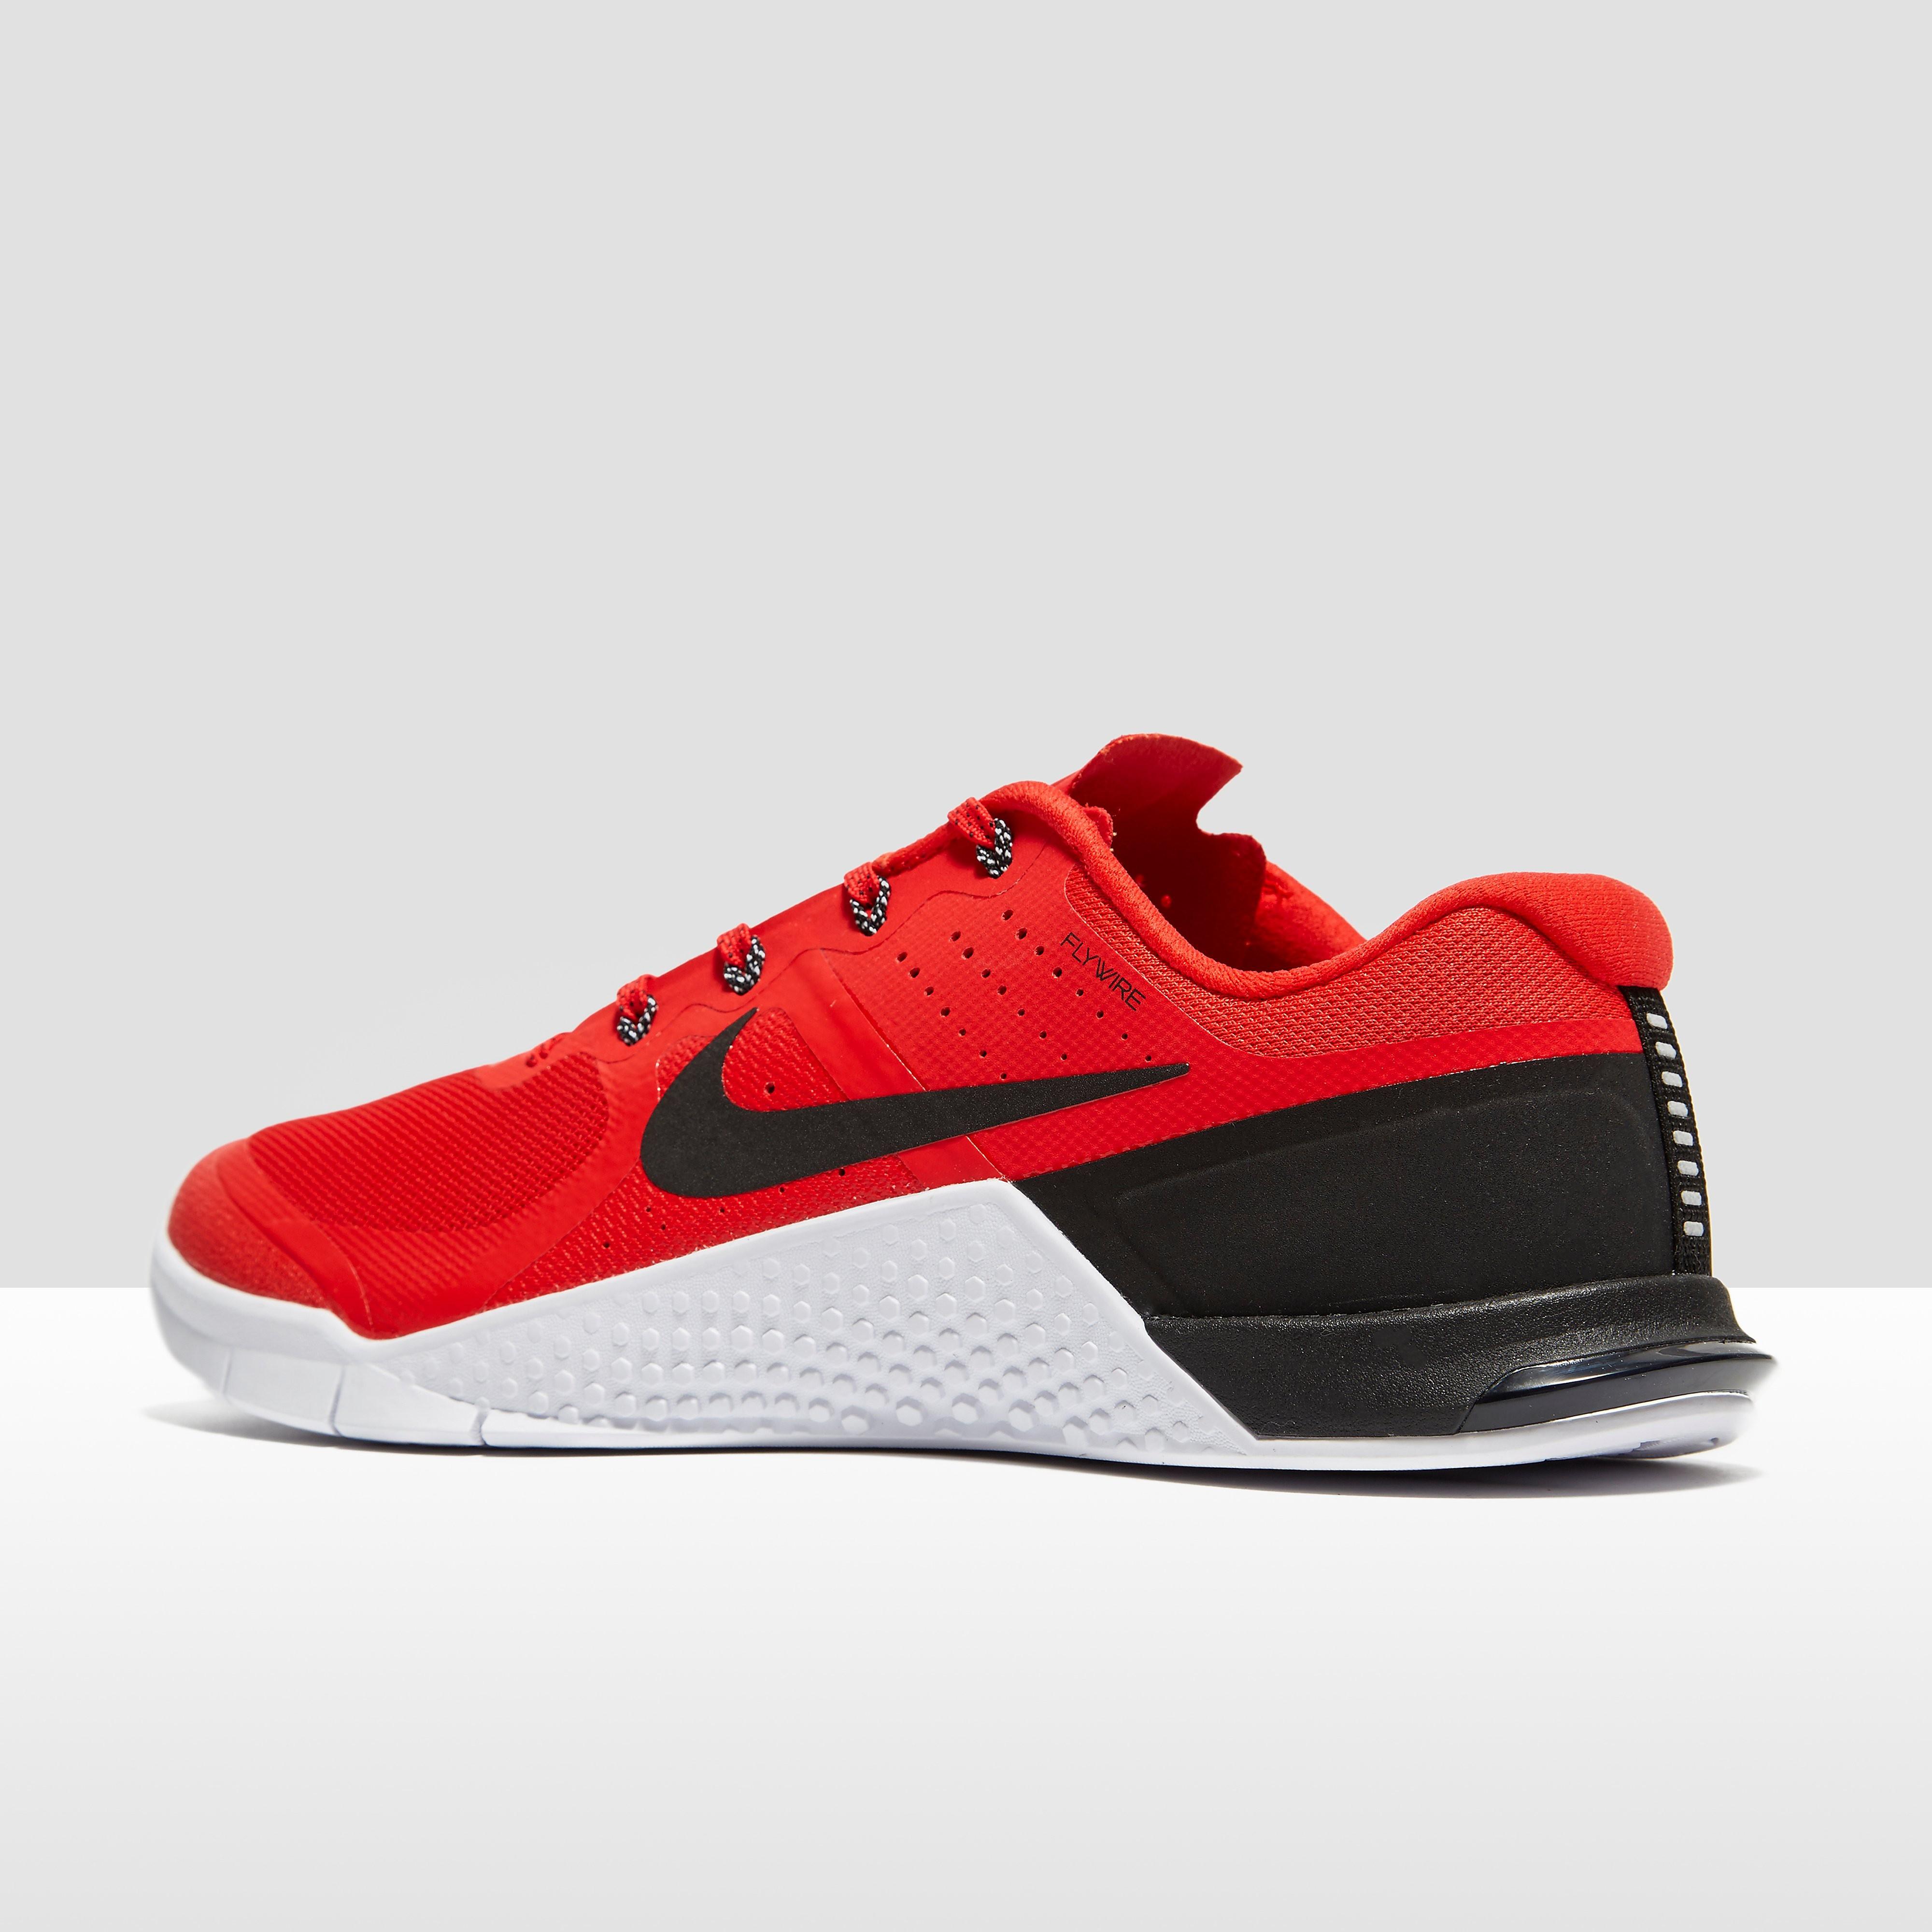 Nike Men's Metcon 2 Training Shoes